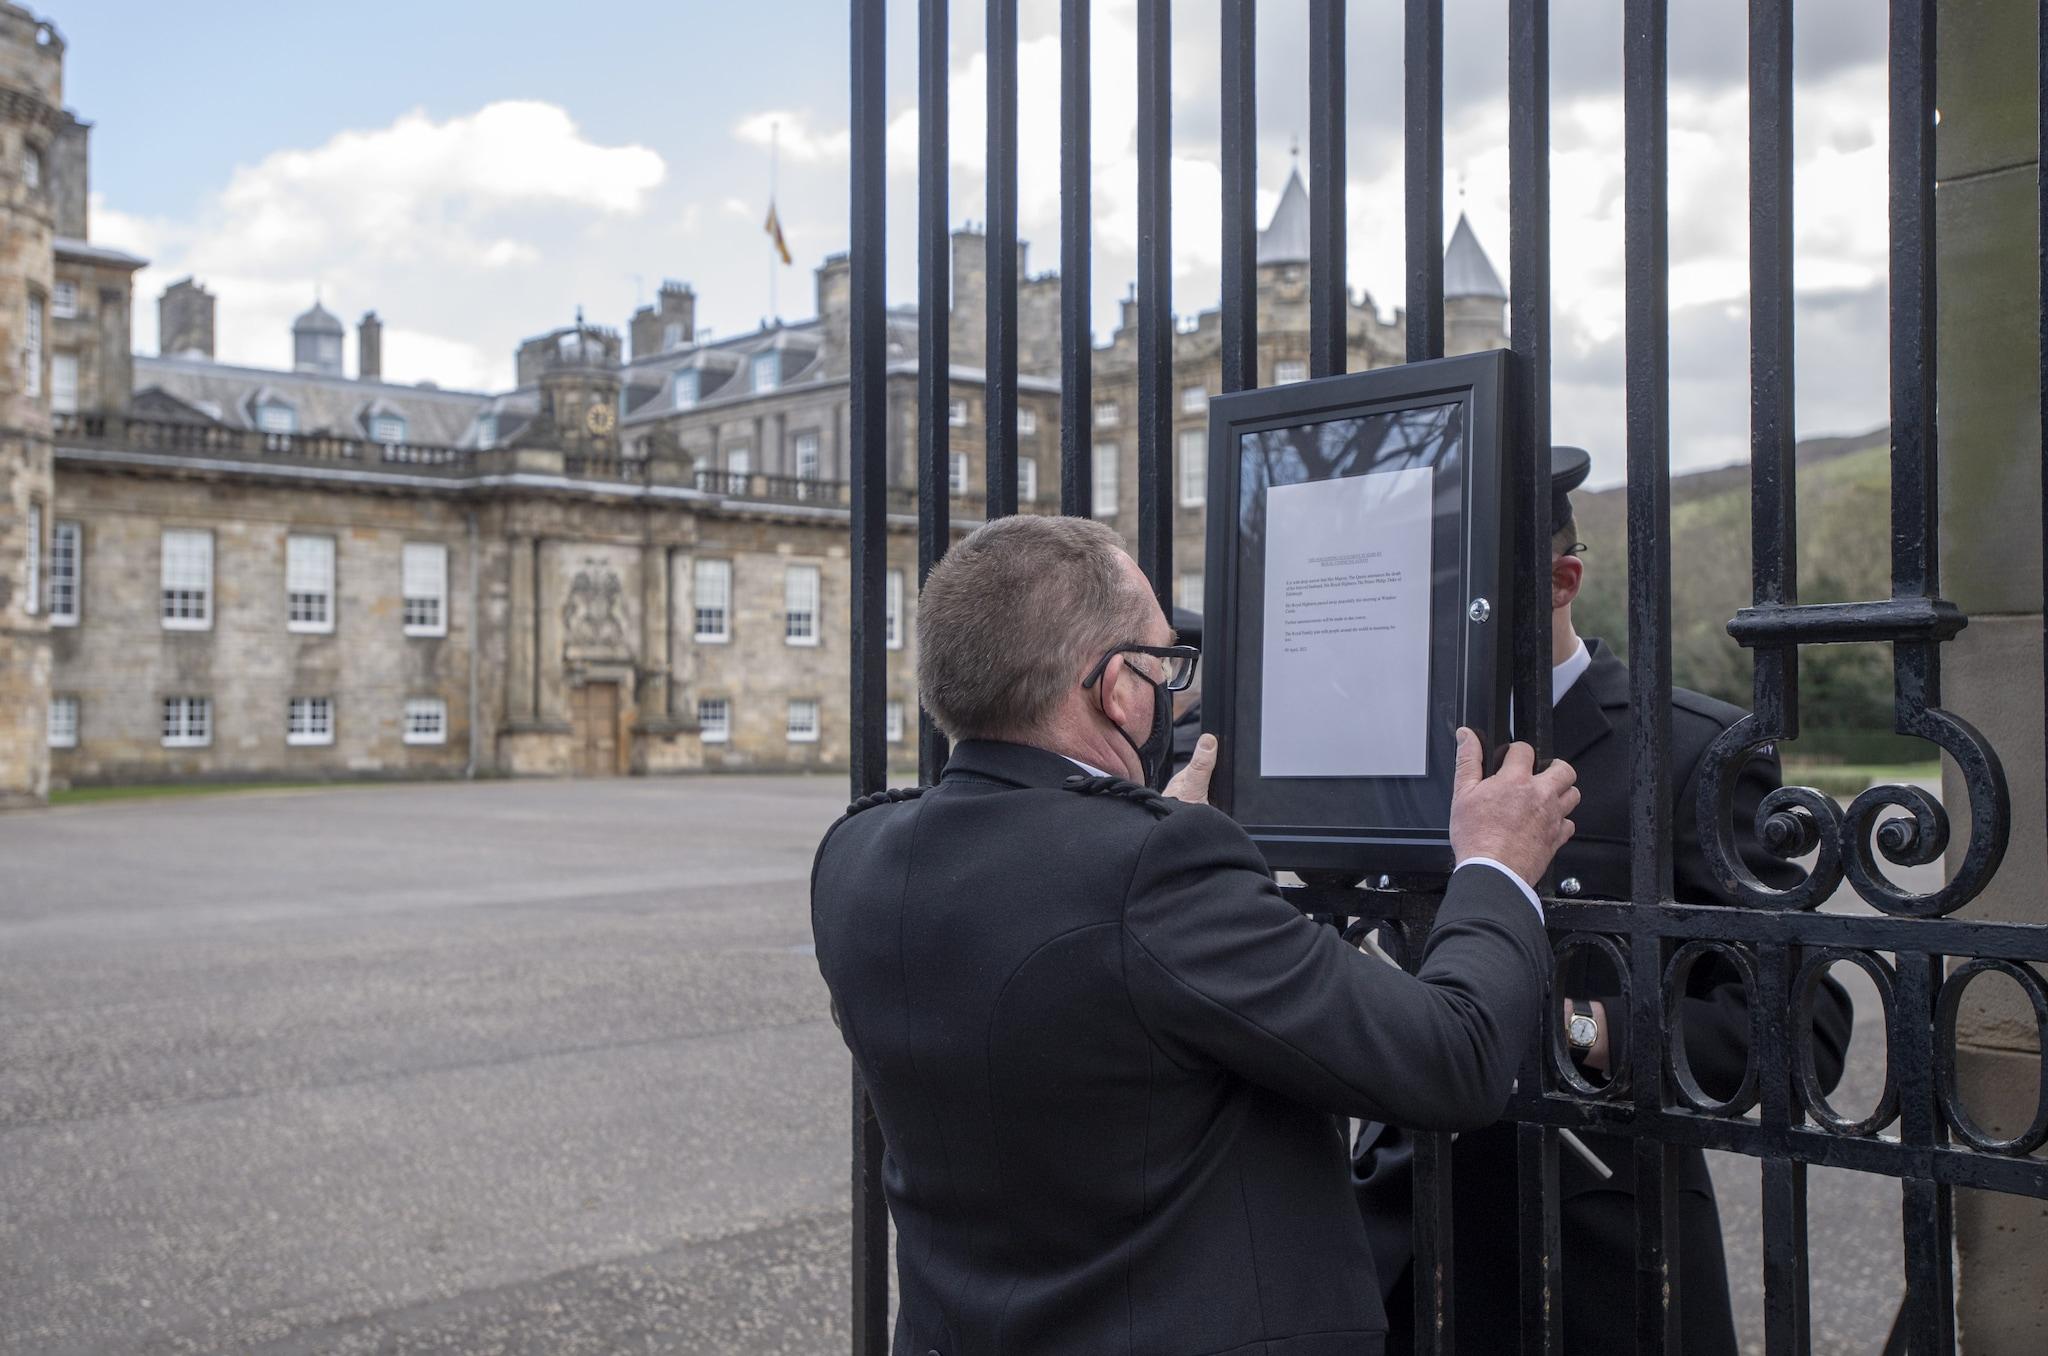 La targa rimossa dai cancelli di Buckingham Palace